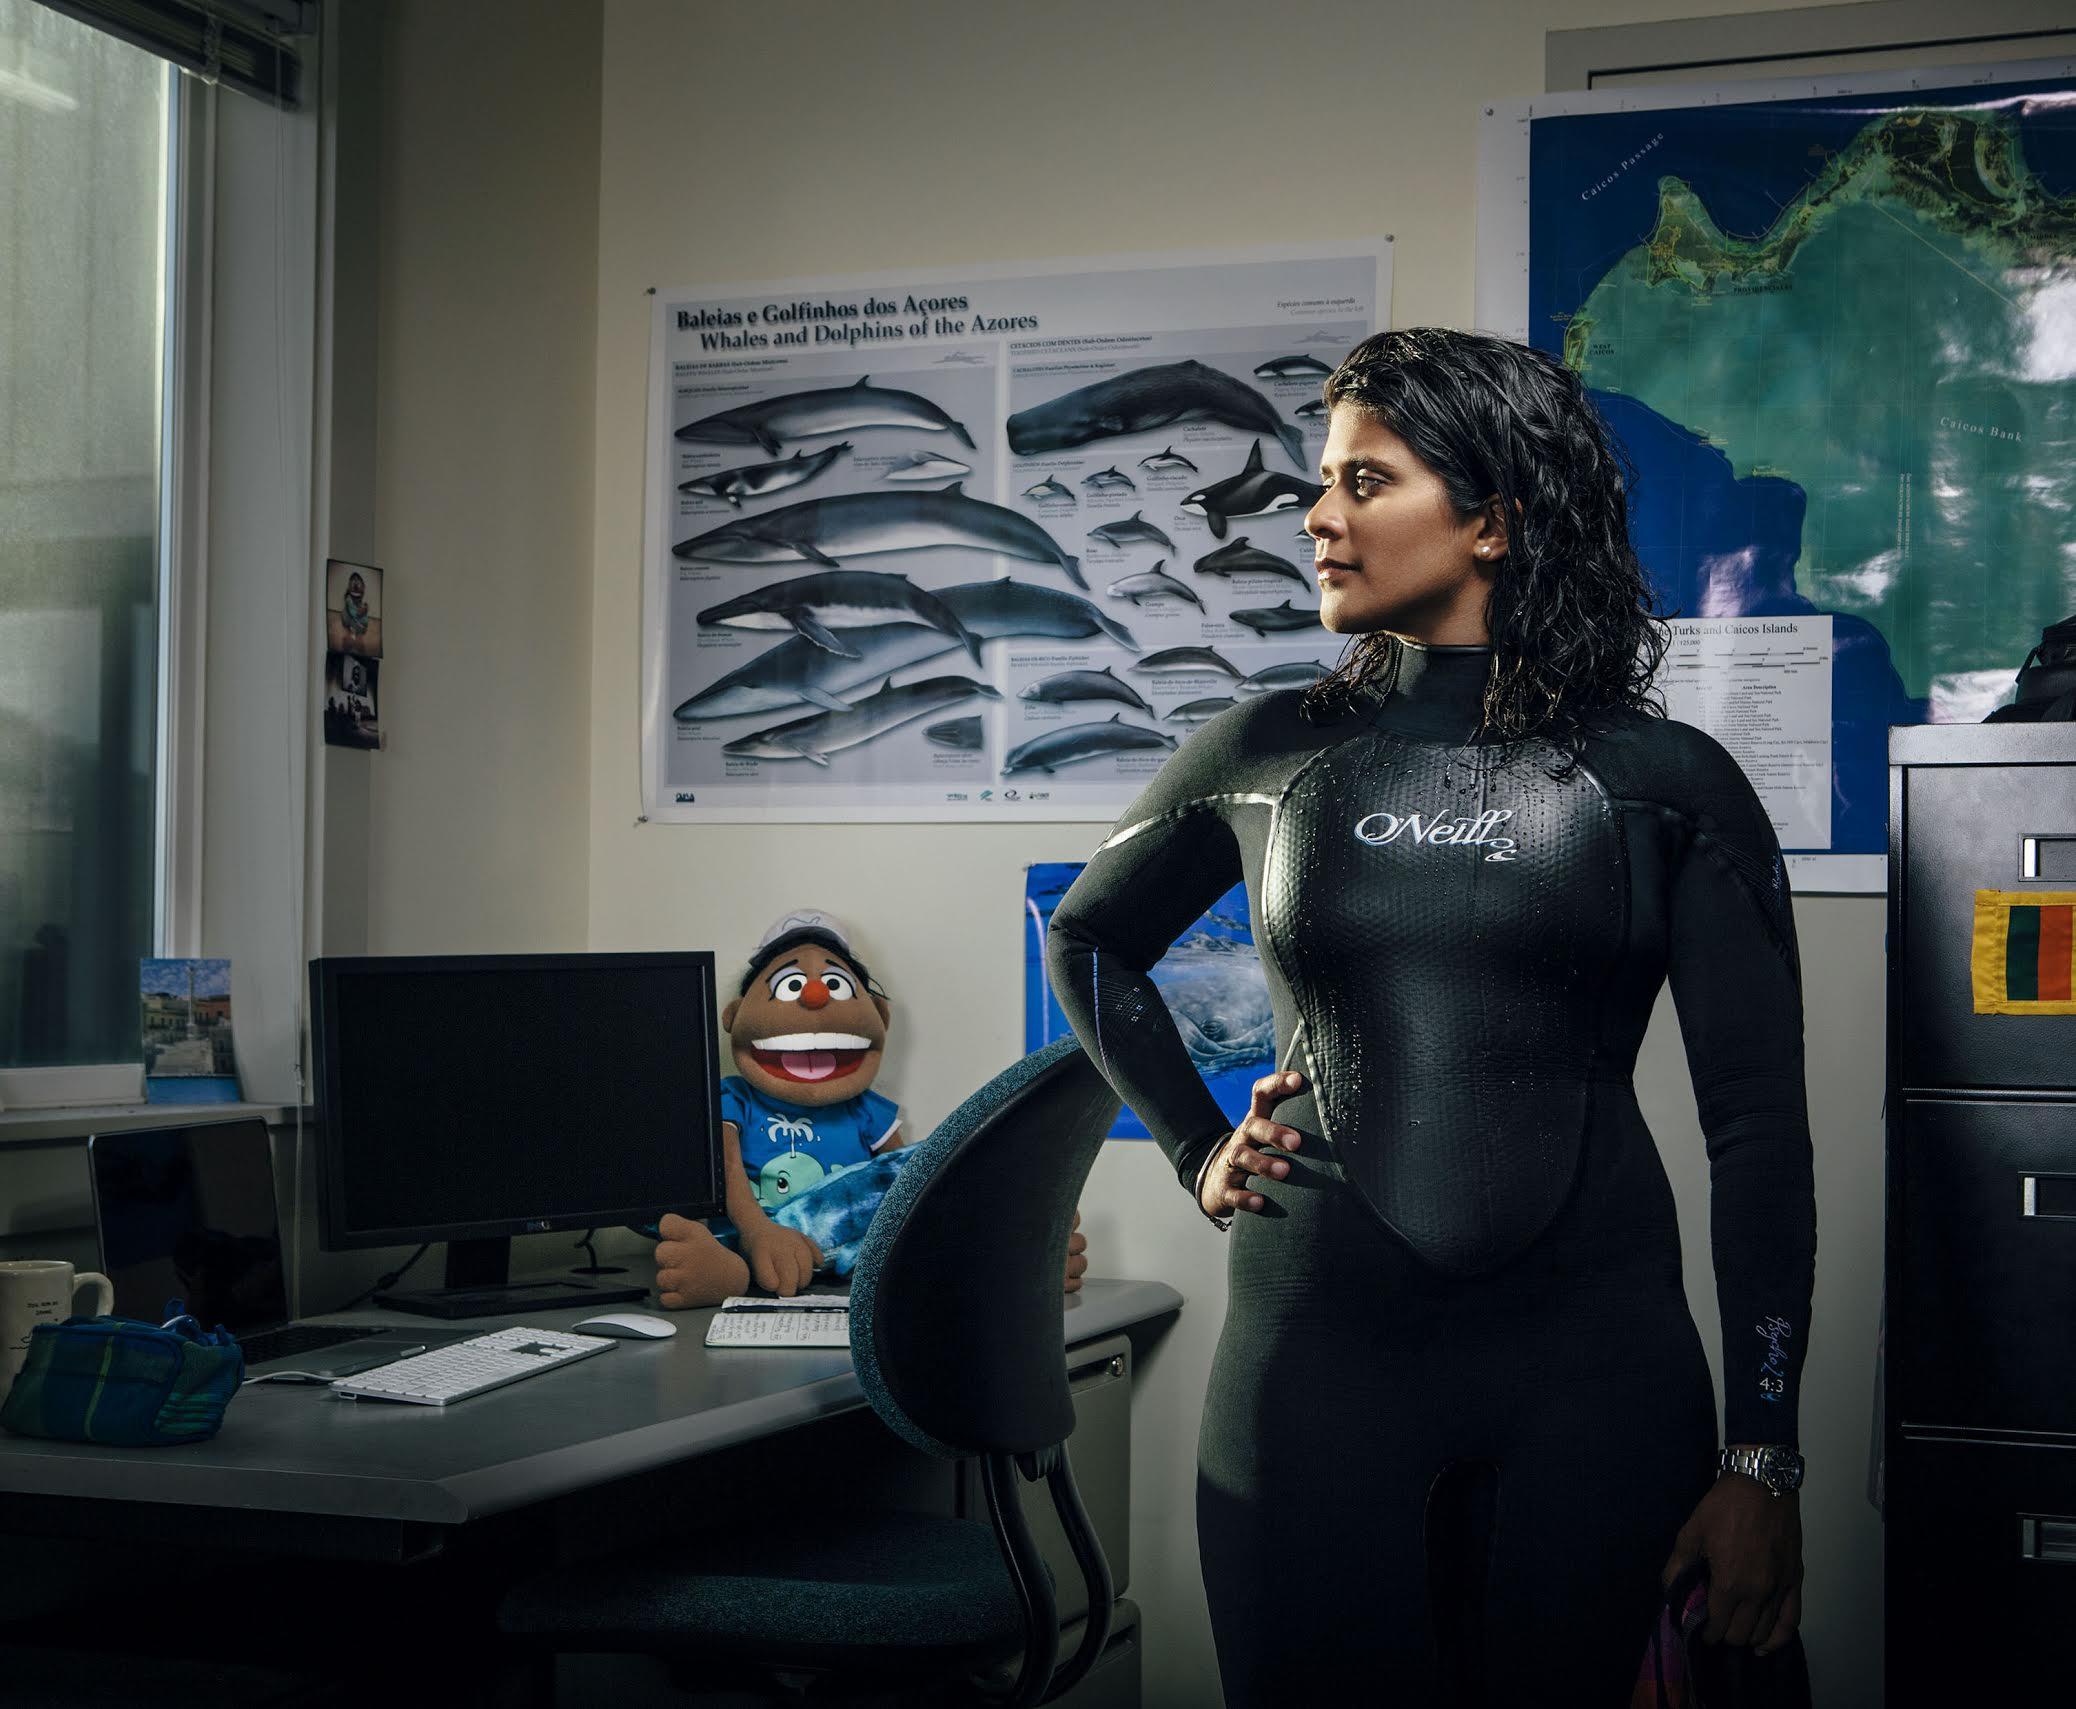 TED Fellow and 2016 National Geographic Emerging Explorer Asha de Vos. Photo: courtesy of Asha de Vos